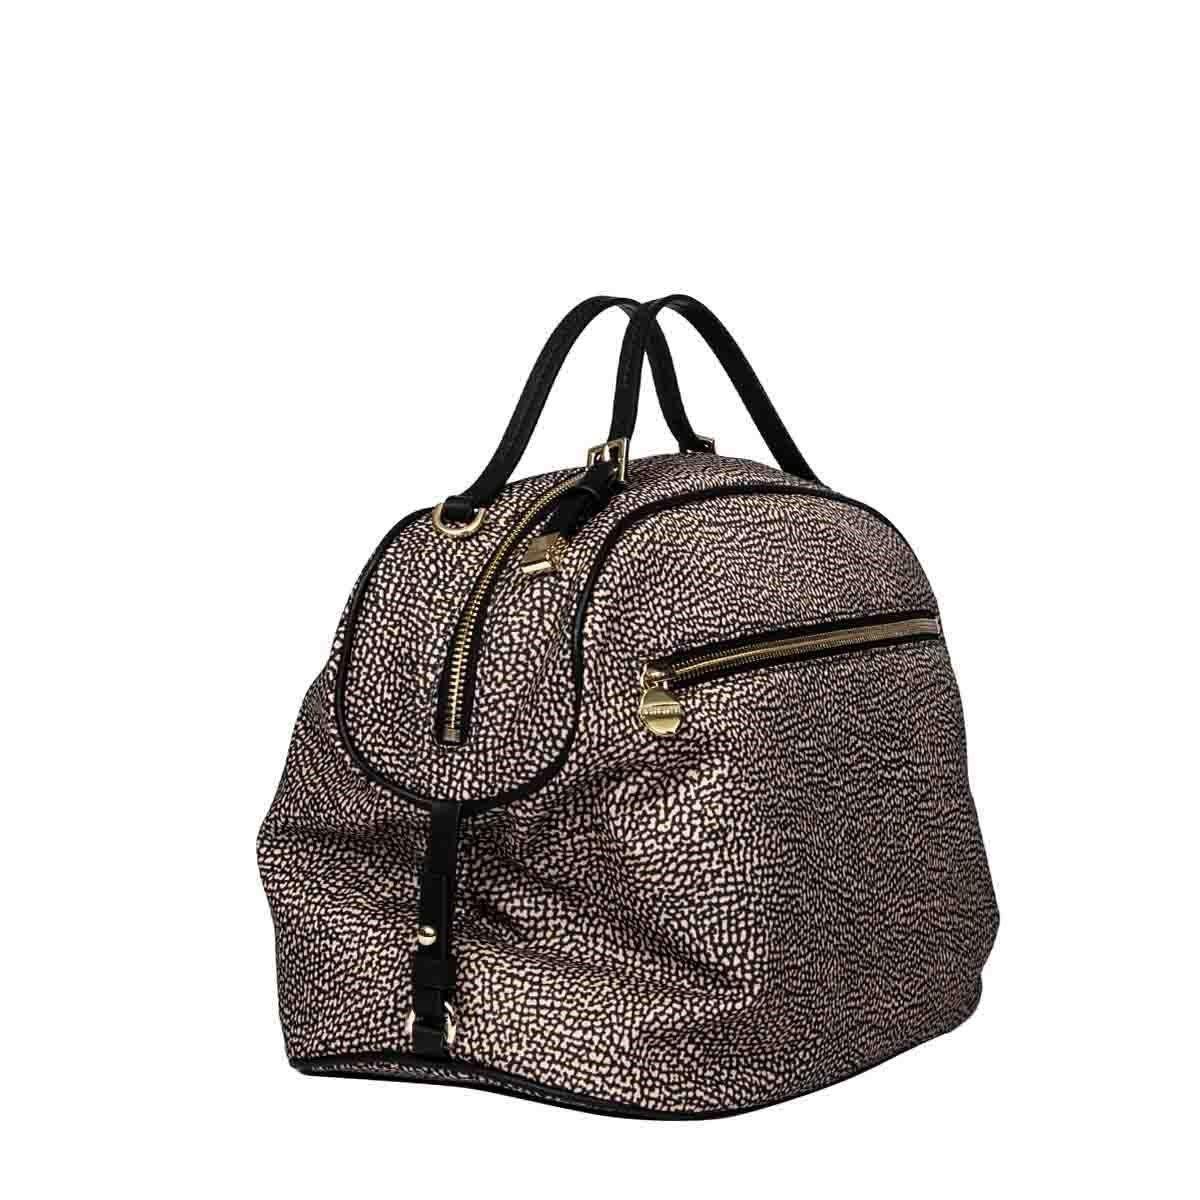 BORBONESE Handbags BORBONESE WOMEN'S BROWN POLYESTER HANDBAG